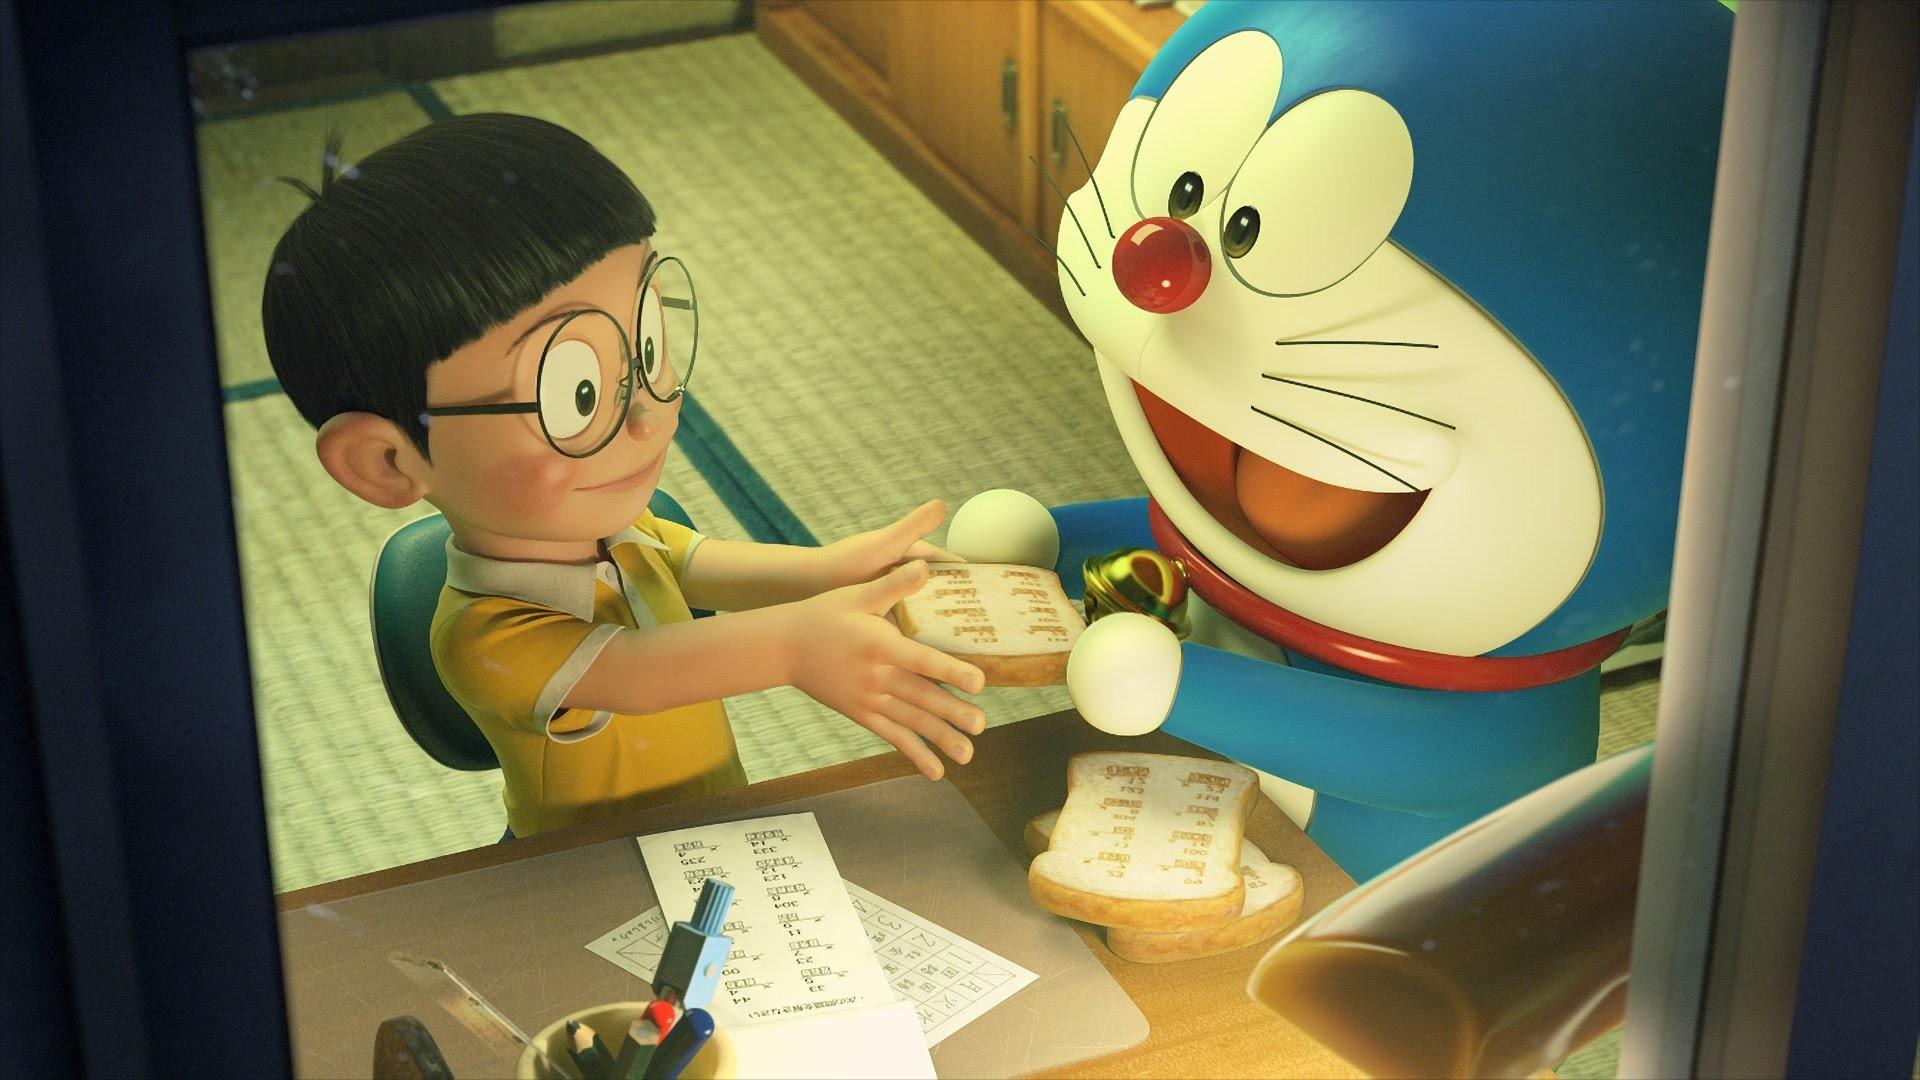 Nemo Pictures Hd Gambar Doraemon Wallpaper Laptop Nemo Images